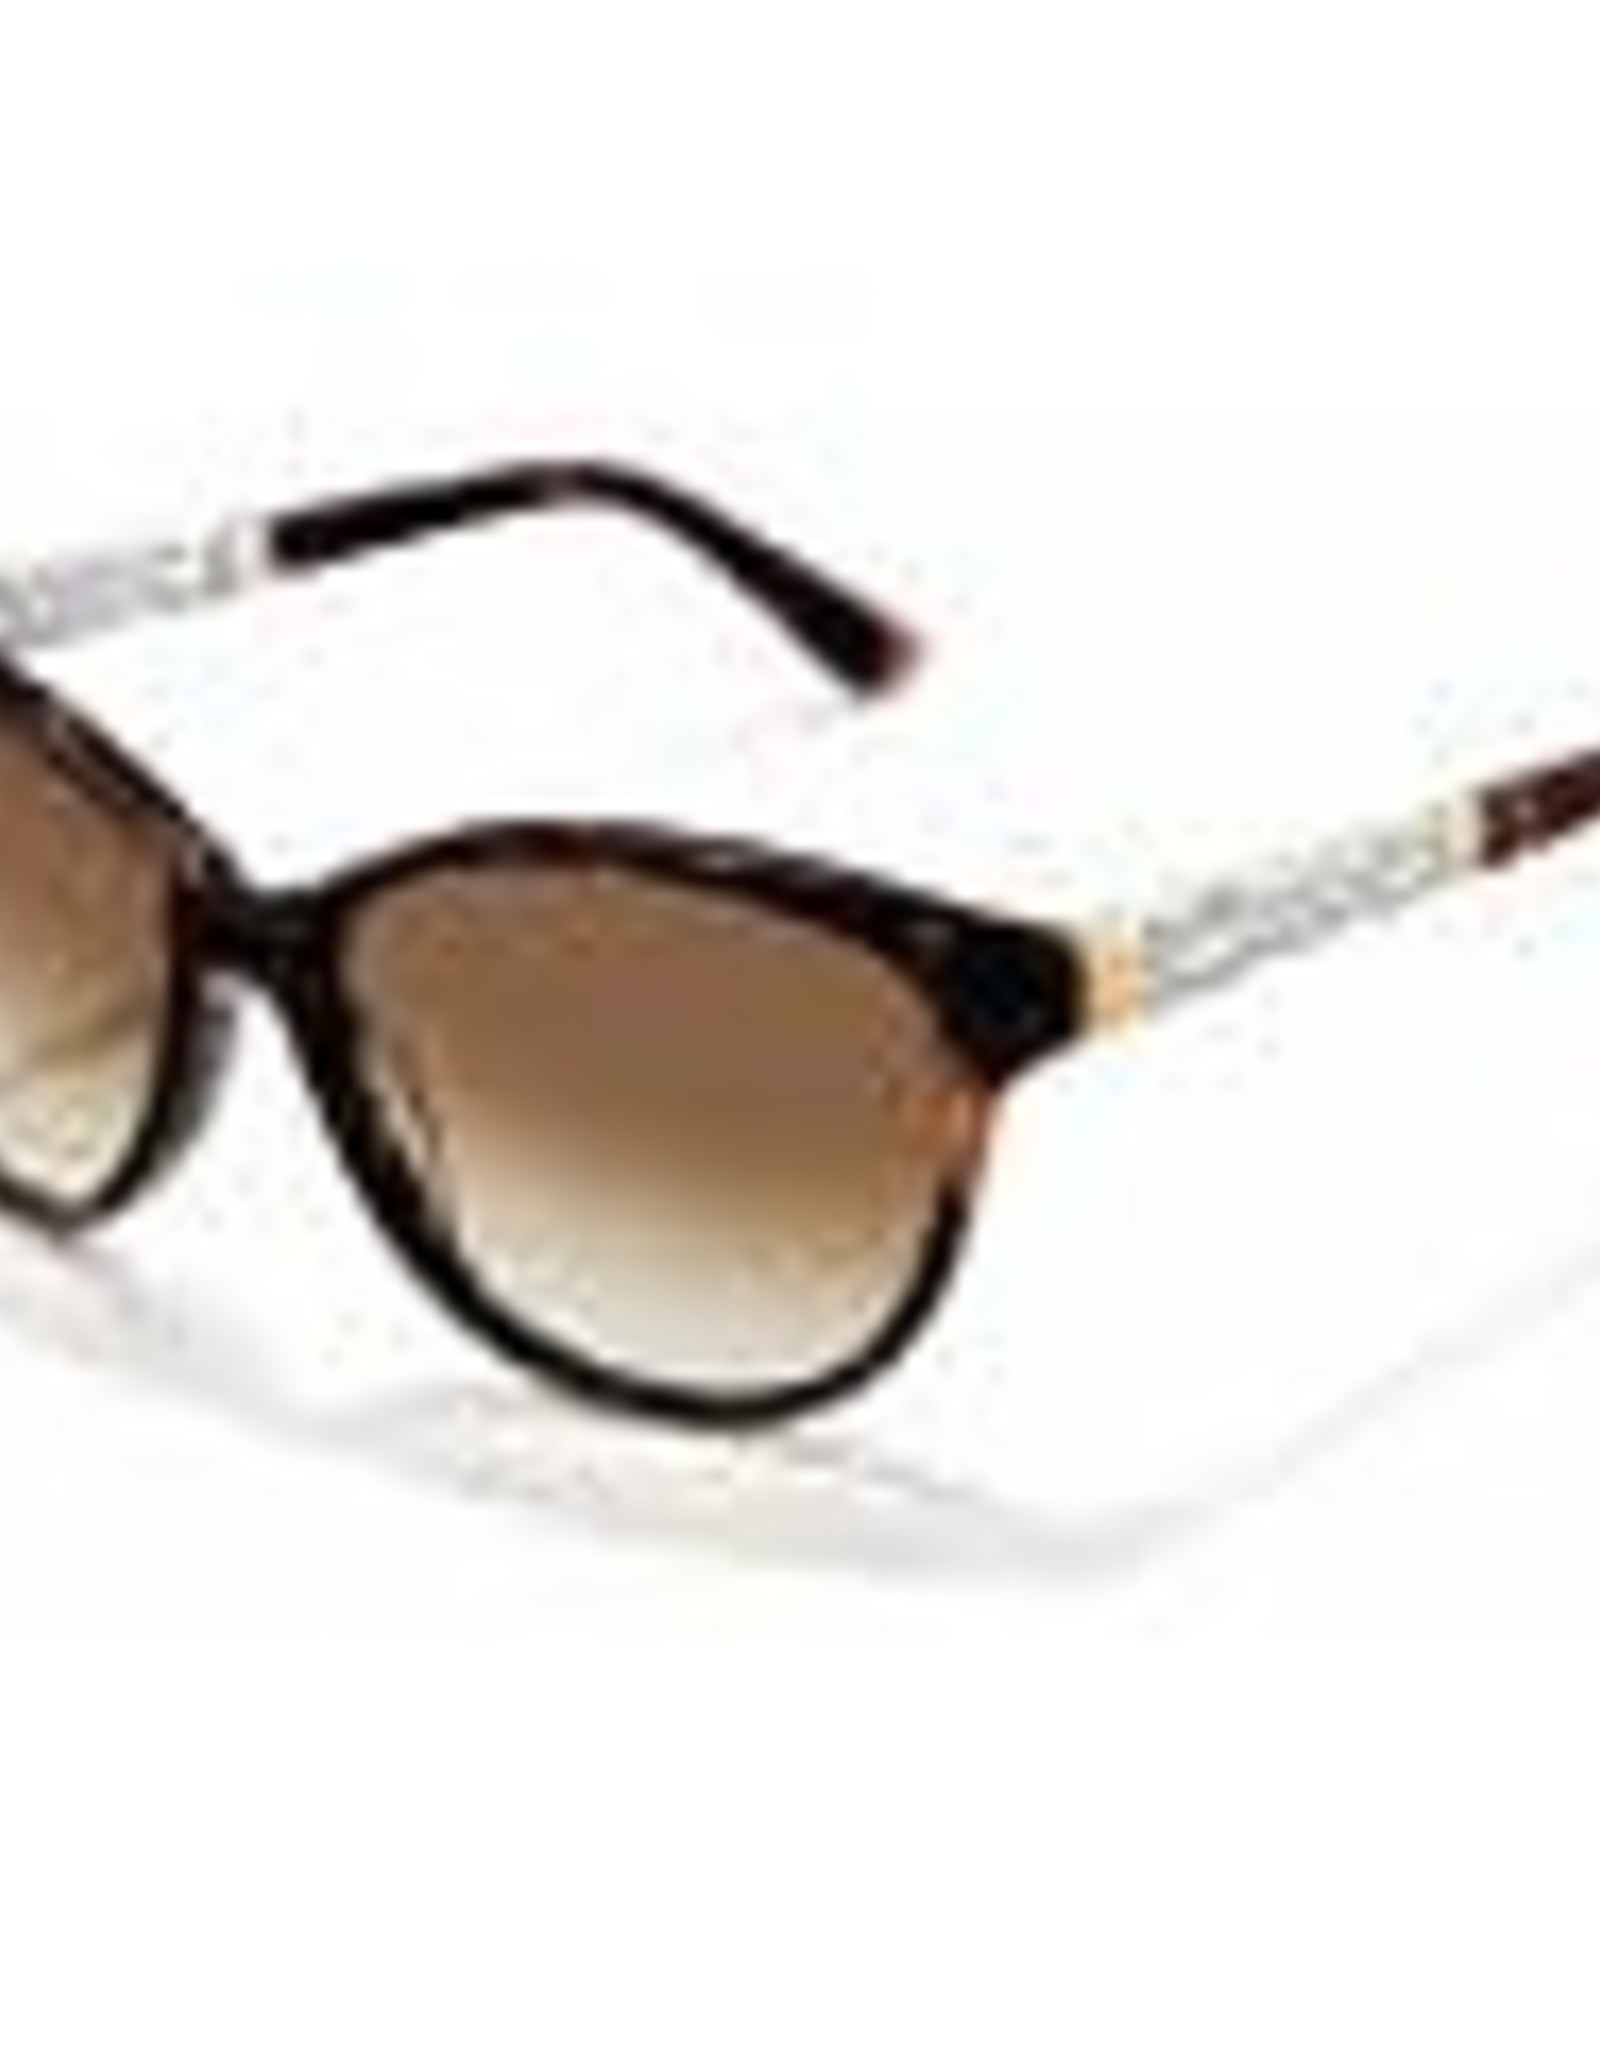 Brighton Brighton Sunglasses-Mamma Mia-Tortoise